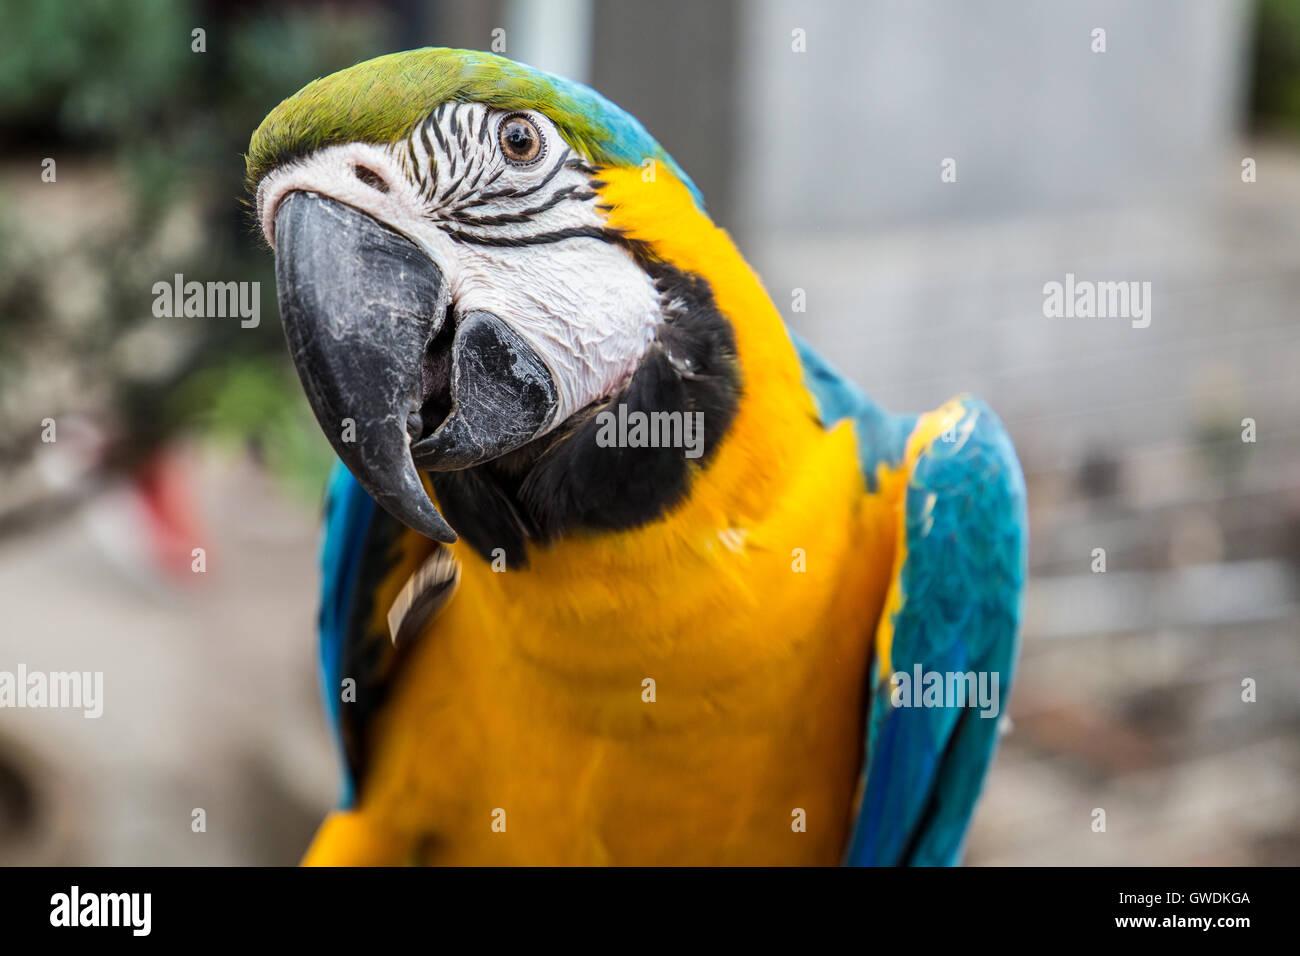 Papagei in der Yuen Po Vogelmarkt, Mong Kok, Kowloon, Hong Kong Stockbild